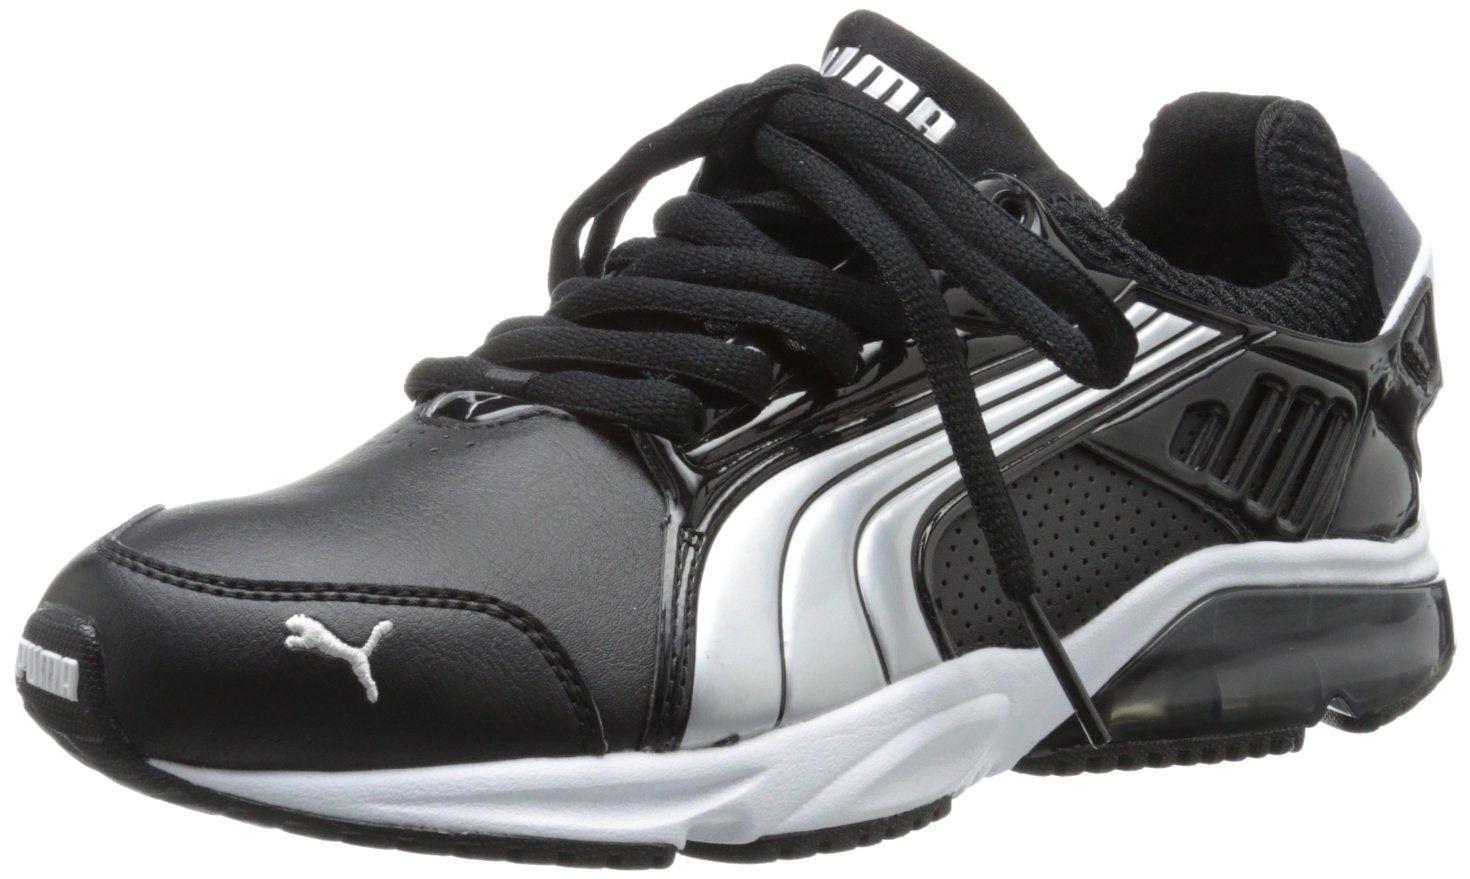 1a5764e32e850 Amazon.com: PUMA Men's Powertech Blaze Metallic Running Shoe ...